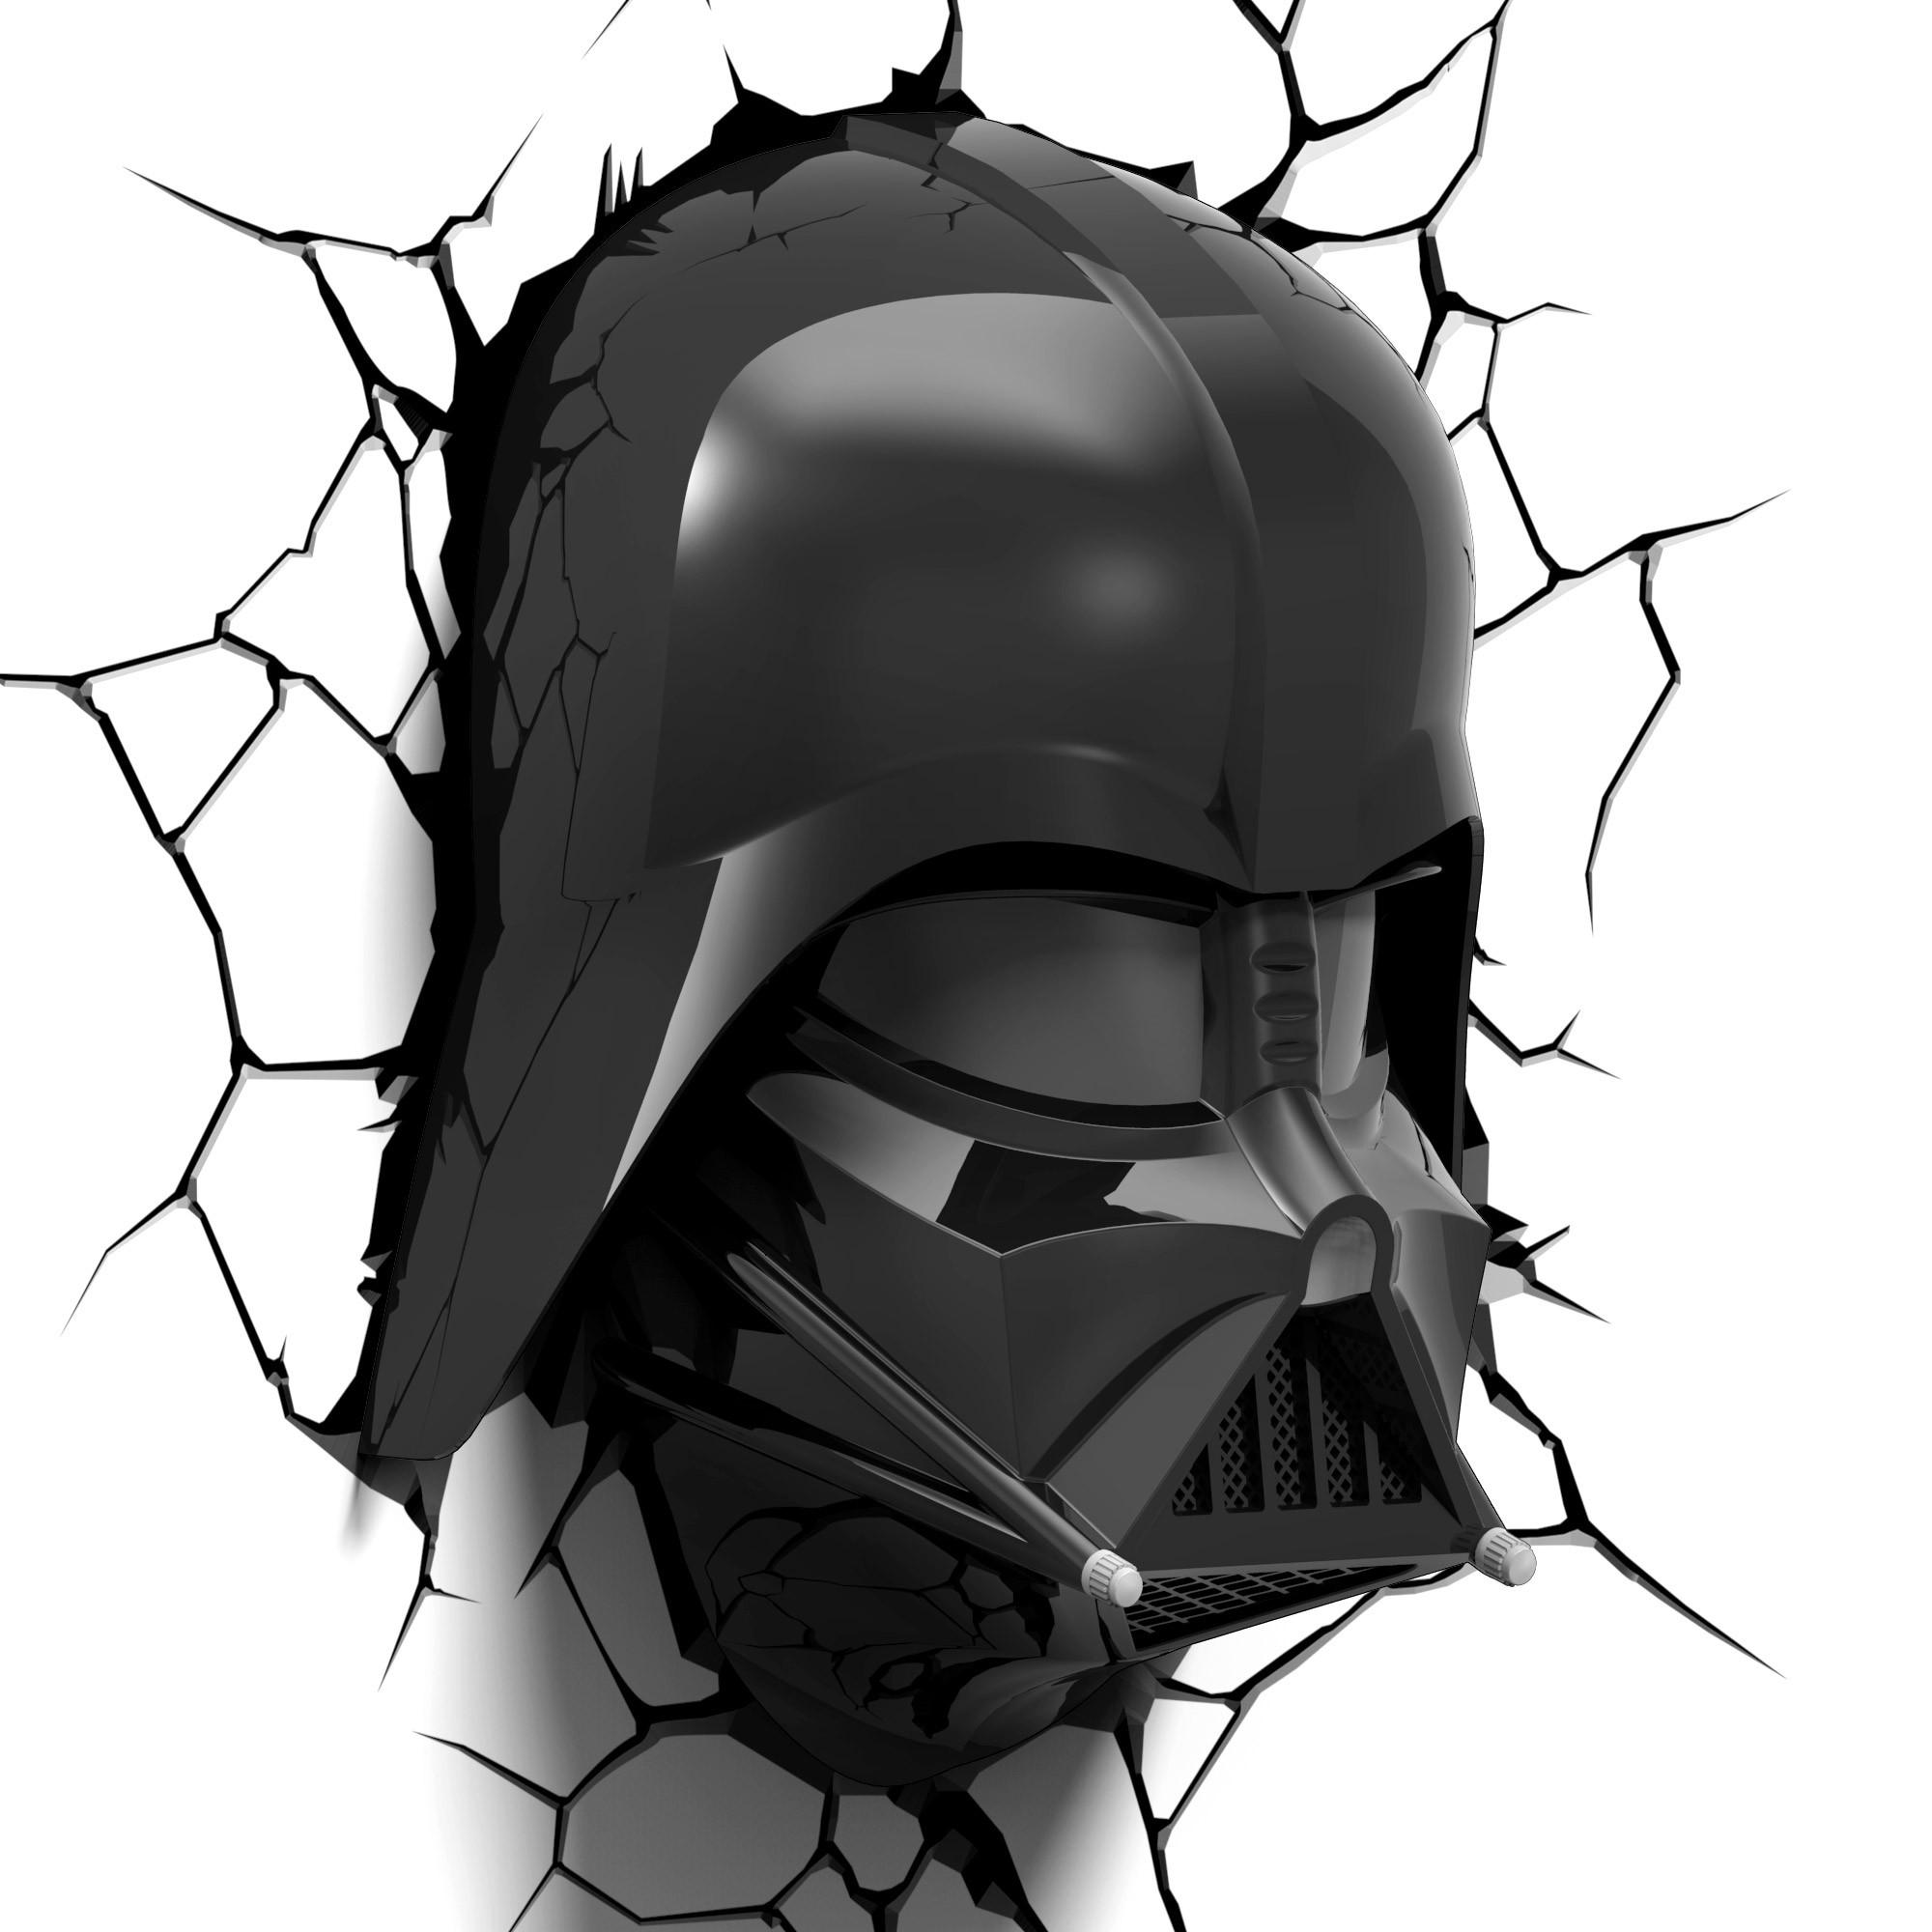 2000x2000 Star Wars 3d Wall Art Light Amp Remote Darth Vader Head This